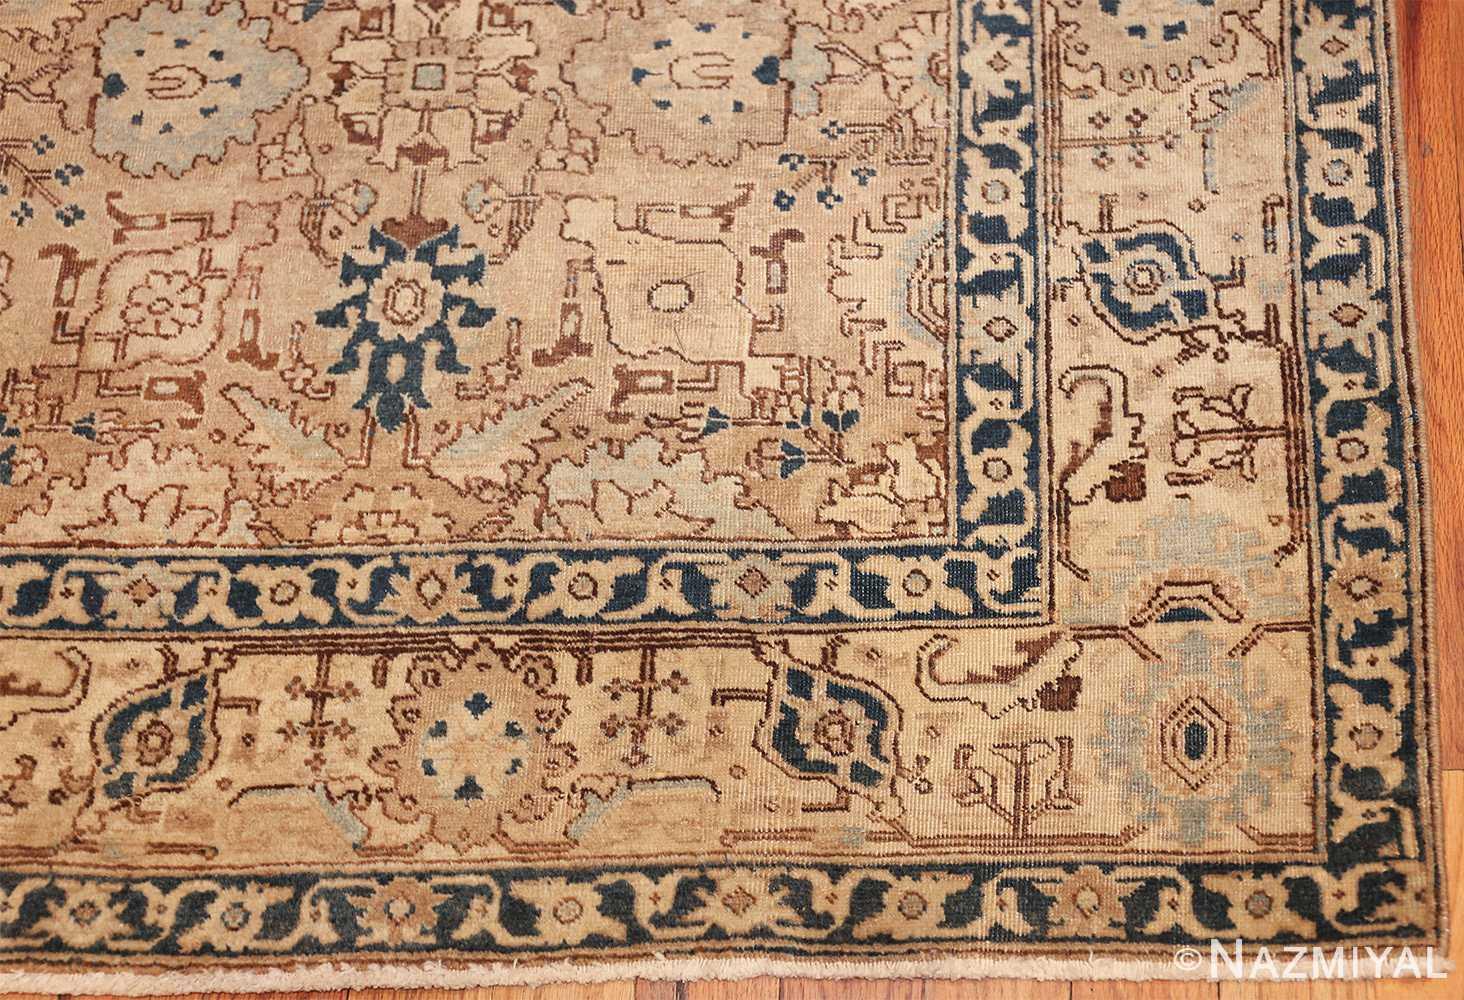 decorative neutral antique room size persian tabriz rug 49666 corner Nazmiyal